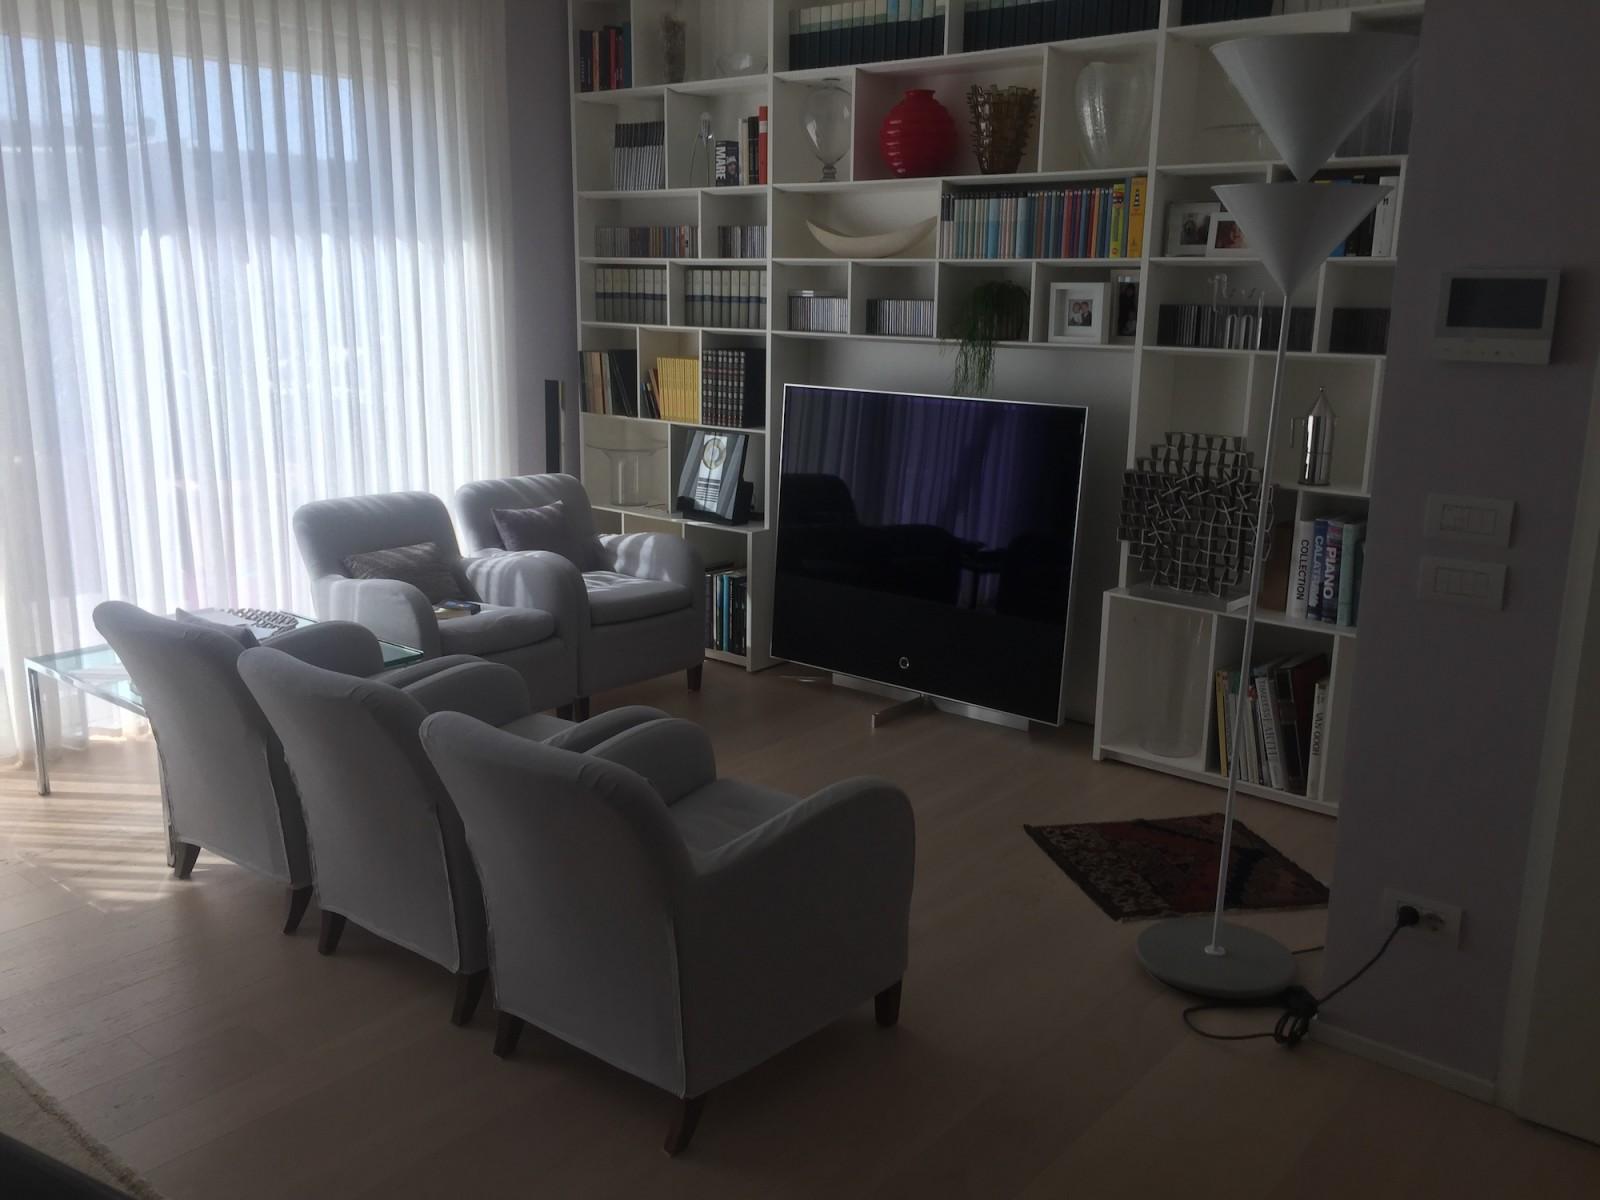 residence-leonardi-da-vinci-costabissara-vicenza-4